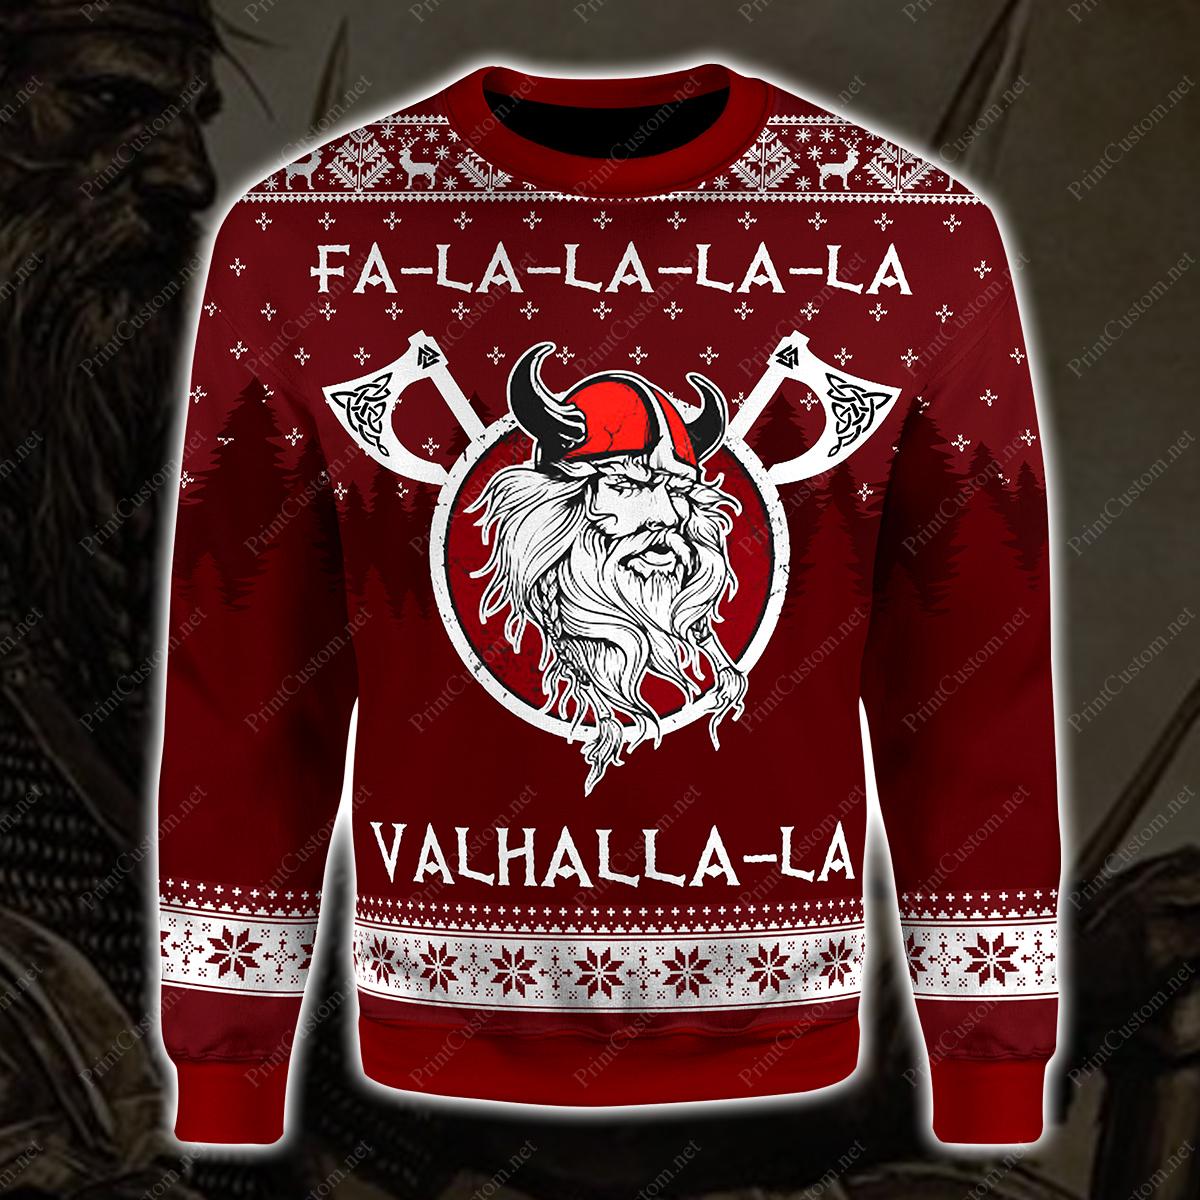 Fa-la-la-la-la valhalla-la viking ugly christmas sweater 1